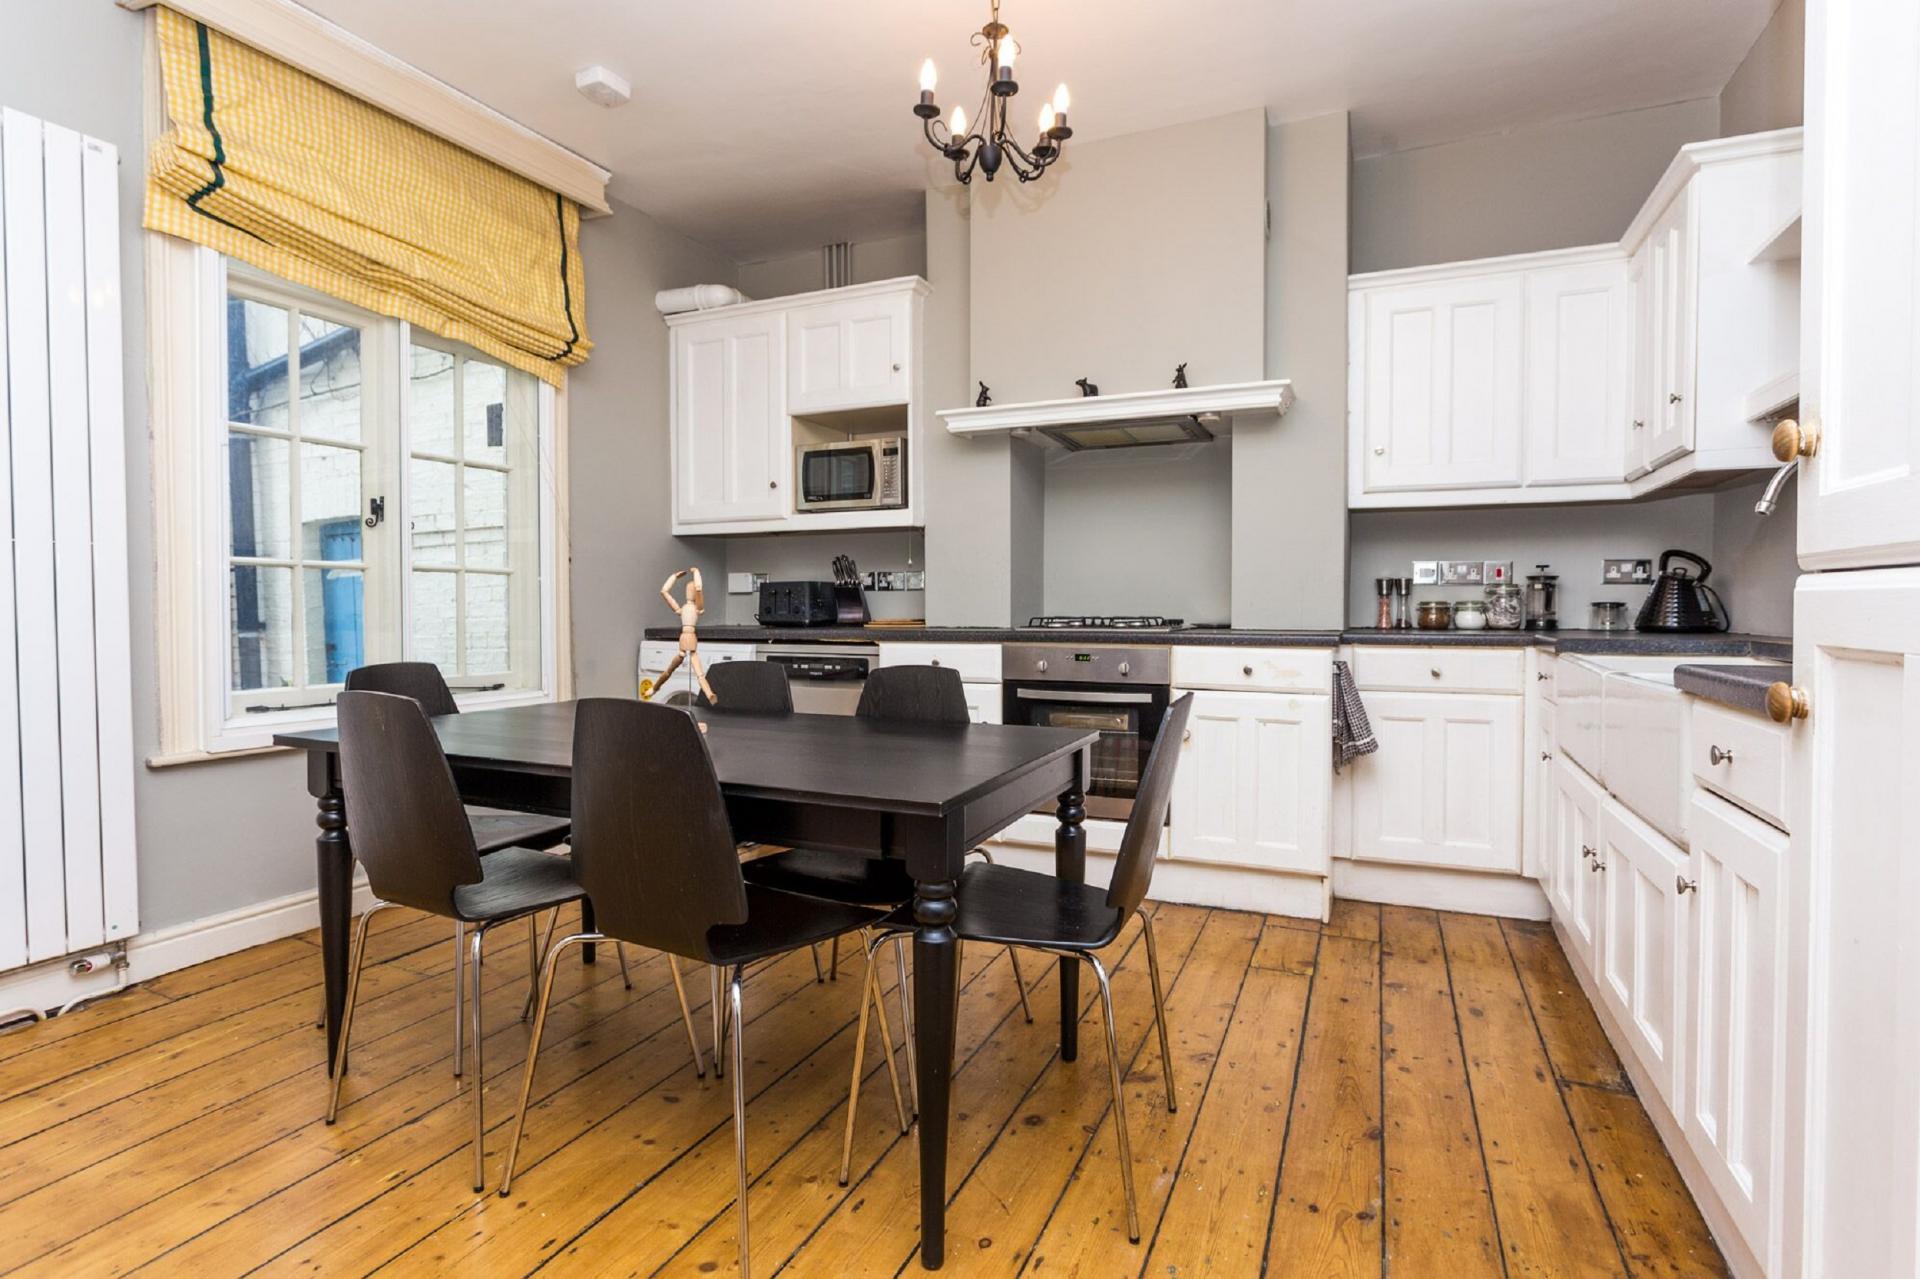 Kitchen at The River Cam Place, Centre, Cambridge - Citybase Apartments